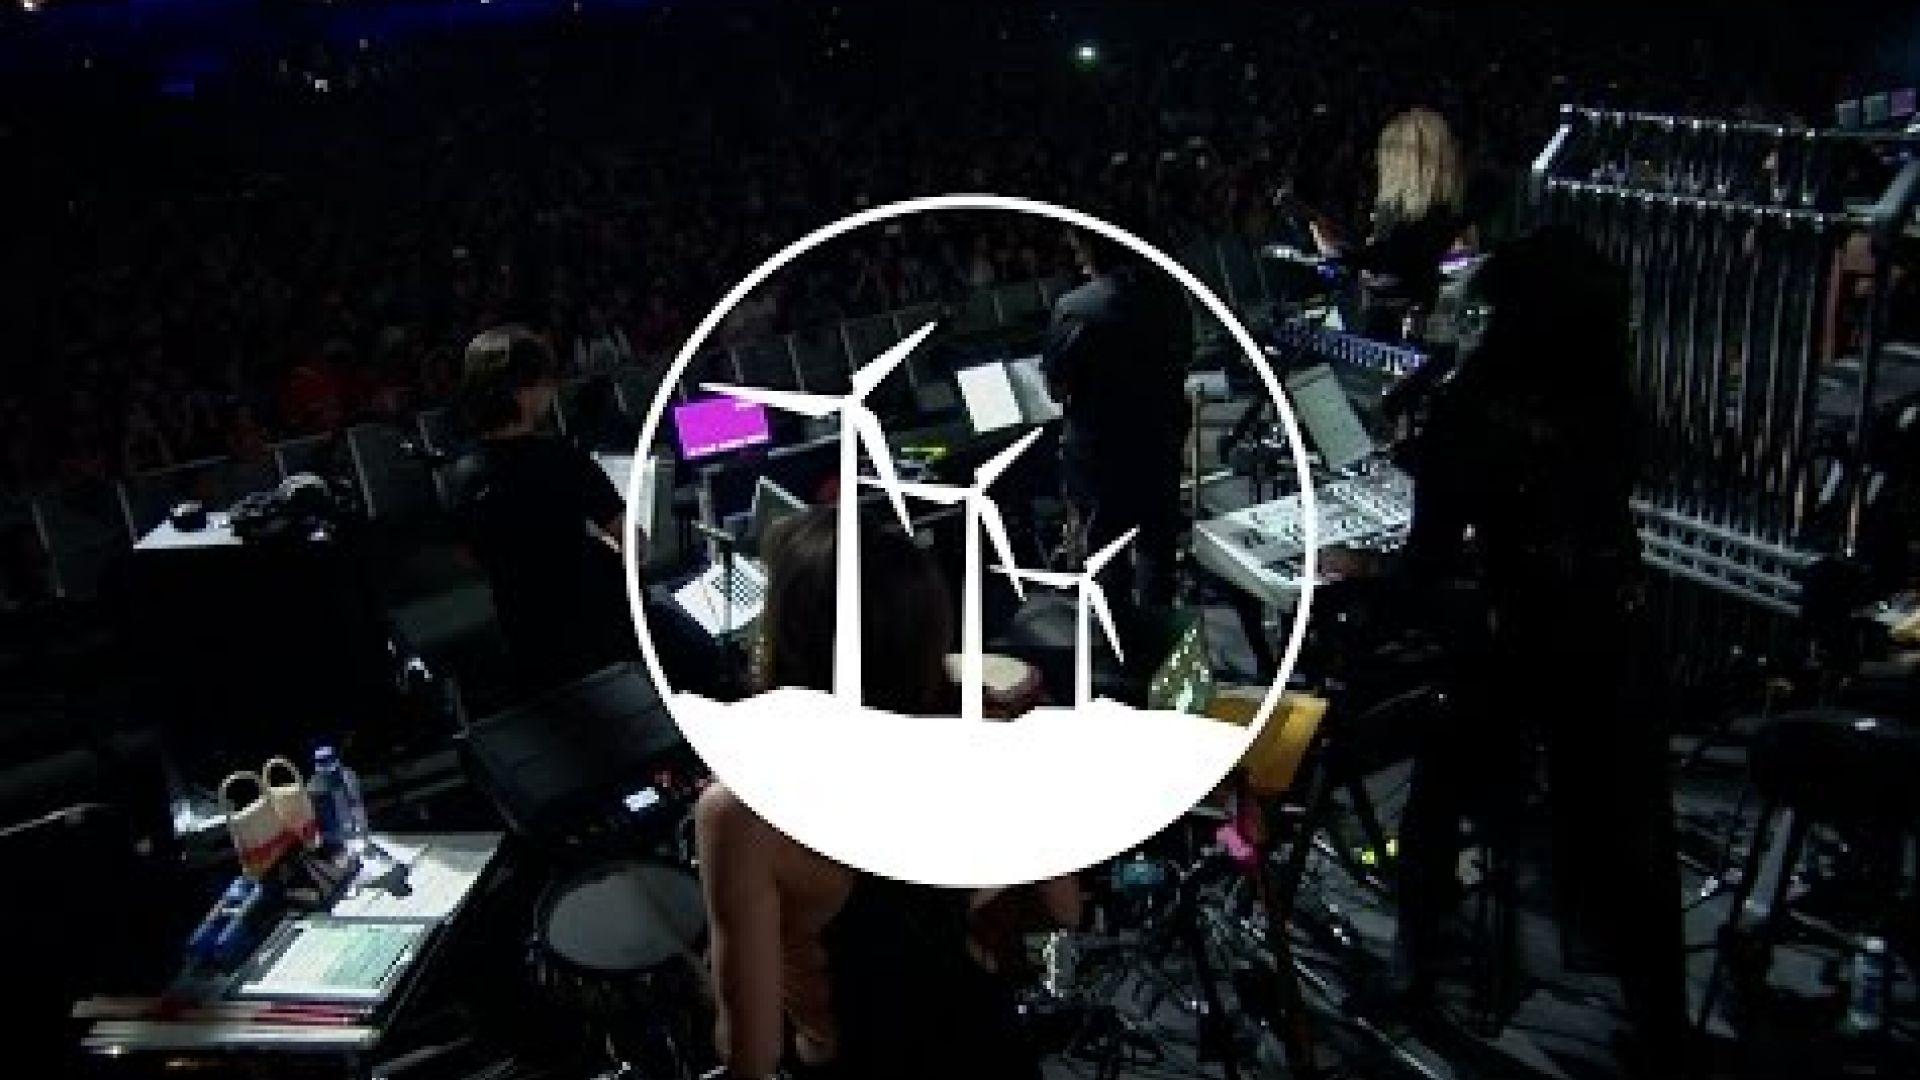 Hans Zimmer Performs 'The Dark Knight' Live At Coachella